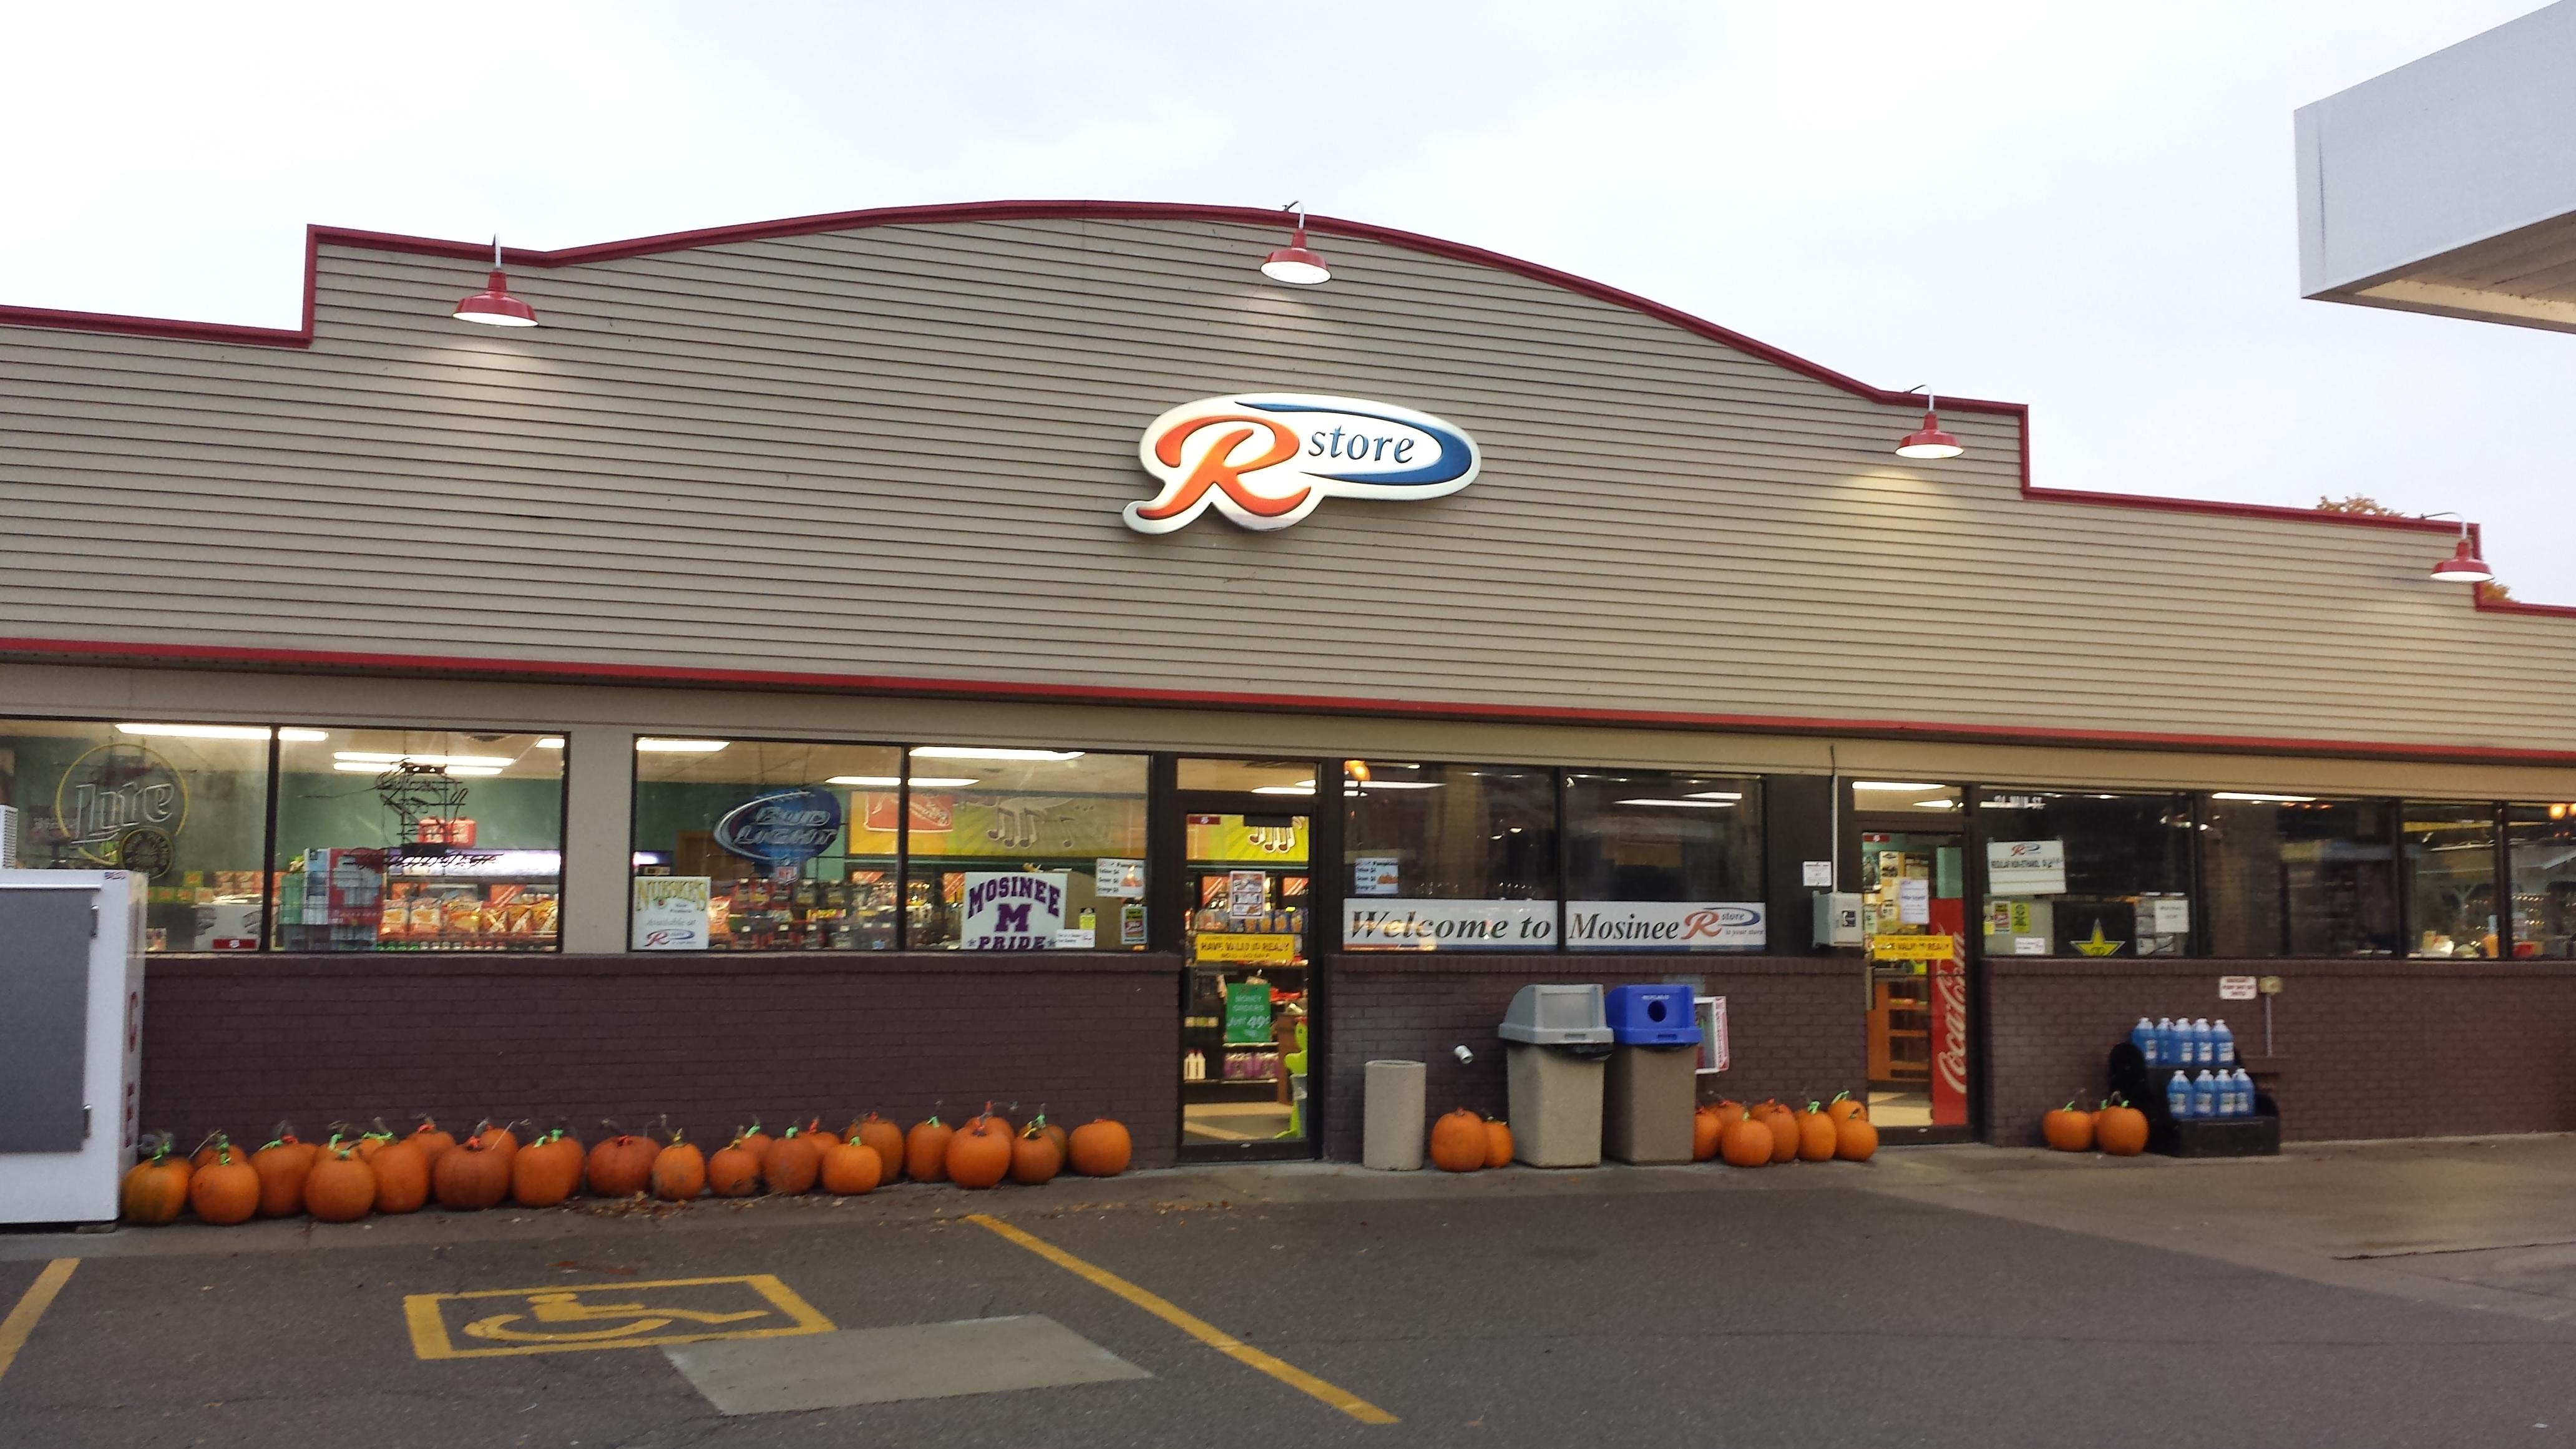 R-Store image 0